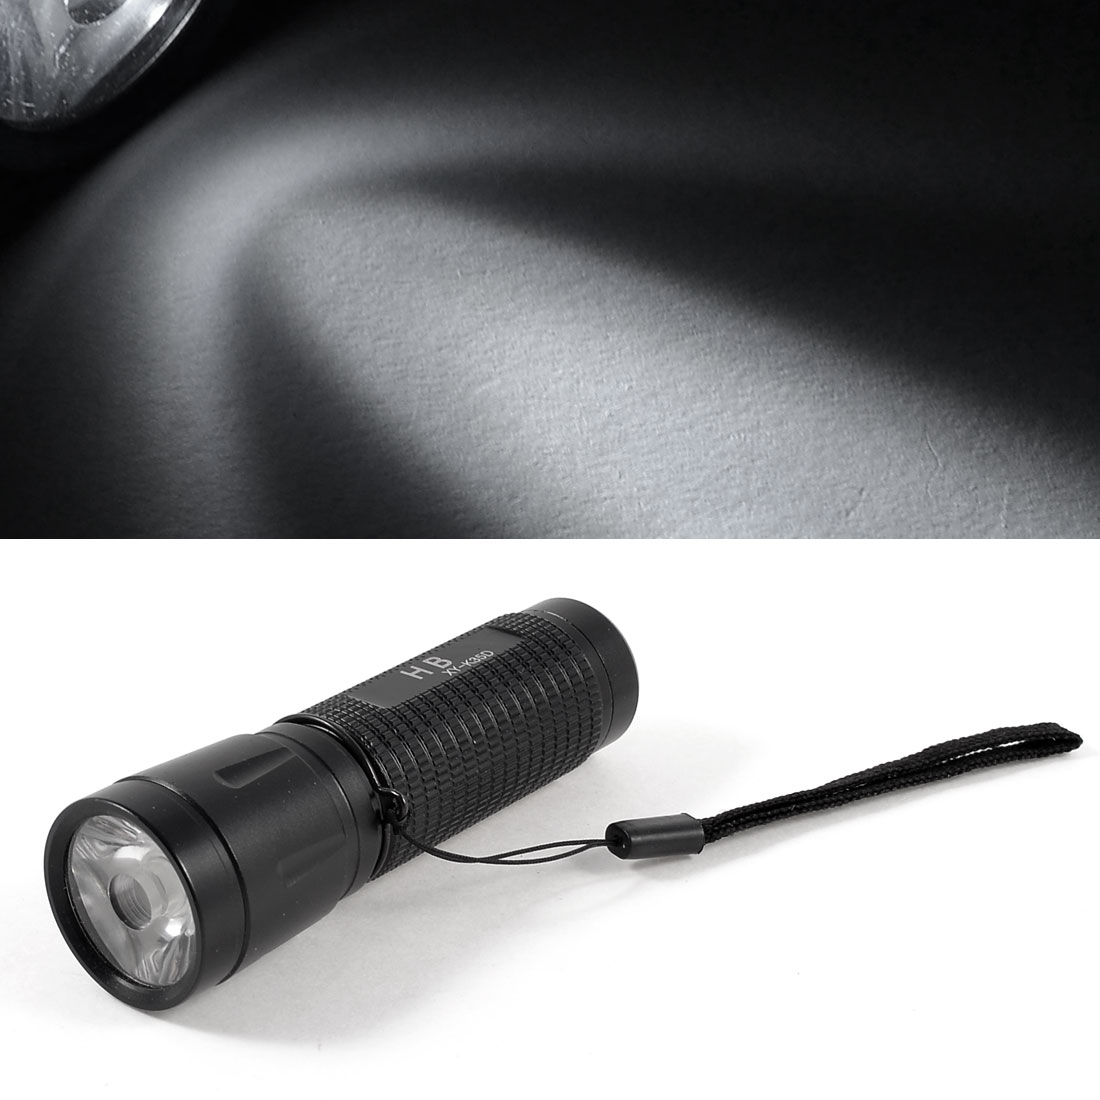 Black Aluminum Shell White Light LED Bulb Camp Flashlight Torch w Strap